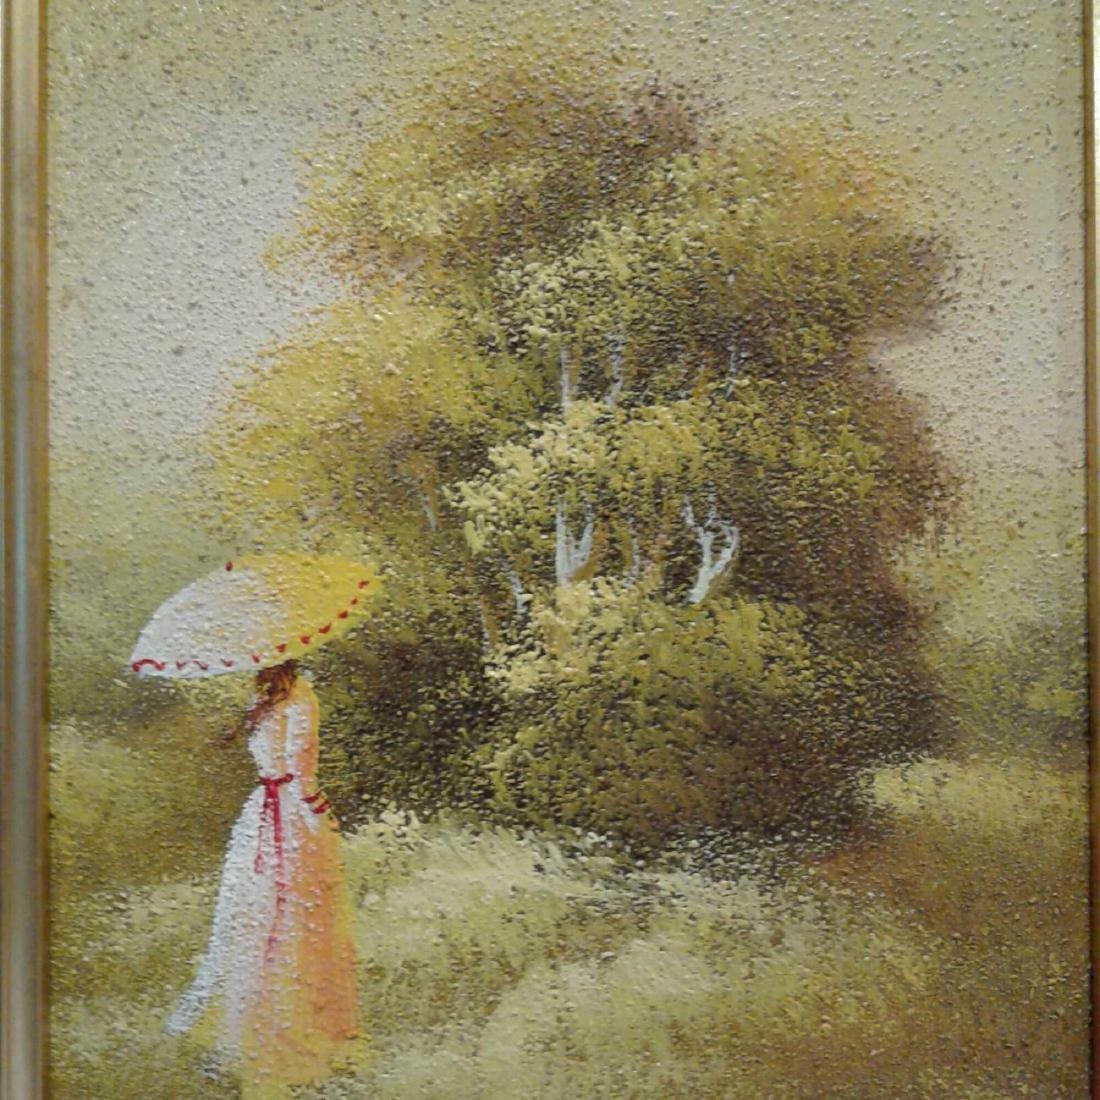 Sandy Grit Textured Impasto Oil Painting - 8